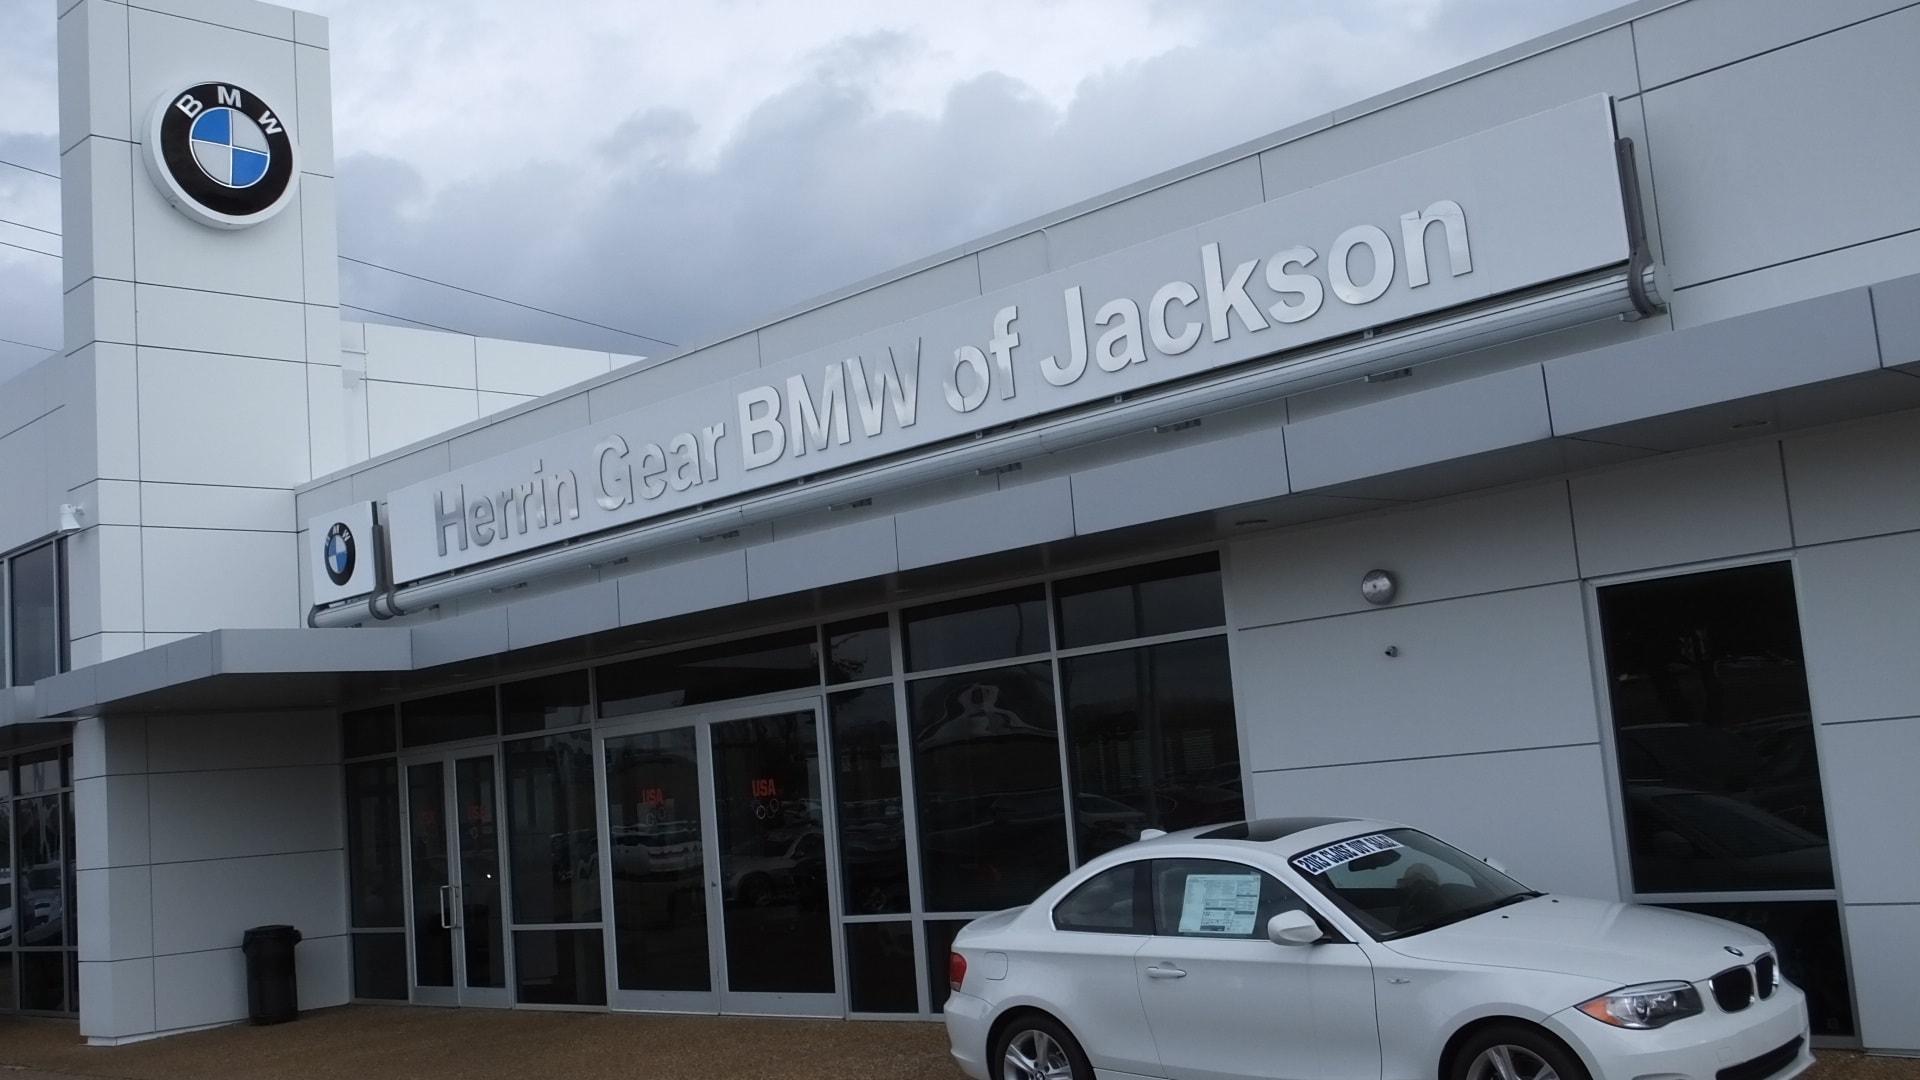 Herrin Gear Bmw >> About Us Herrin Gear Bmw Of Jackson